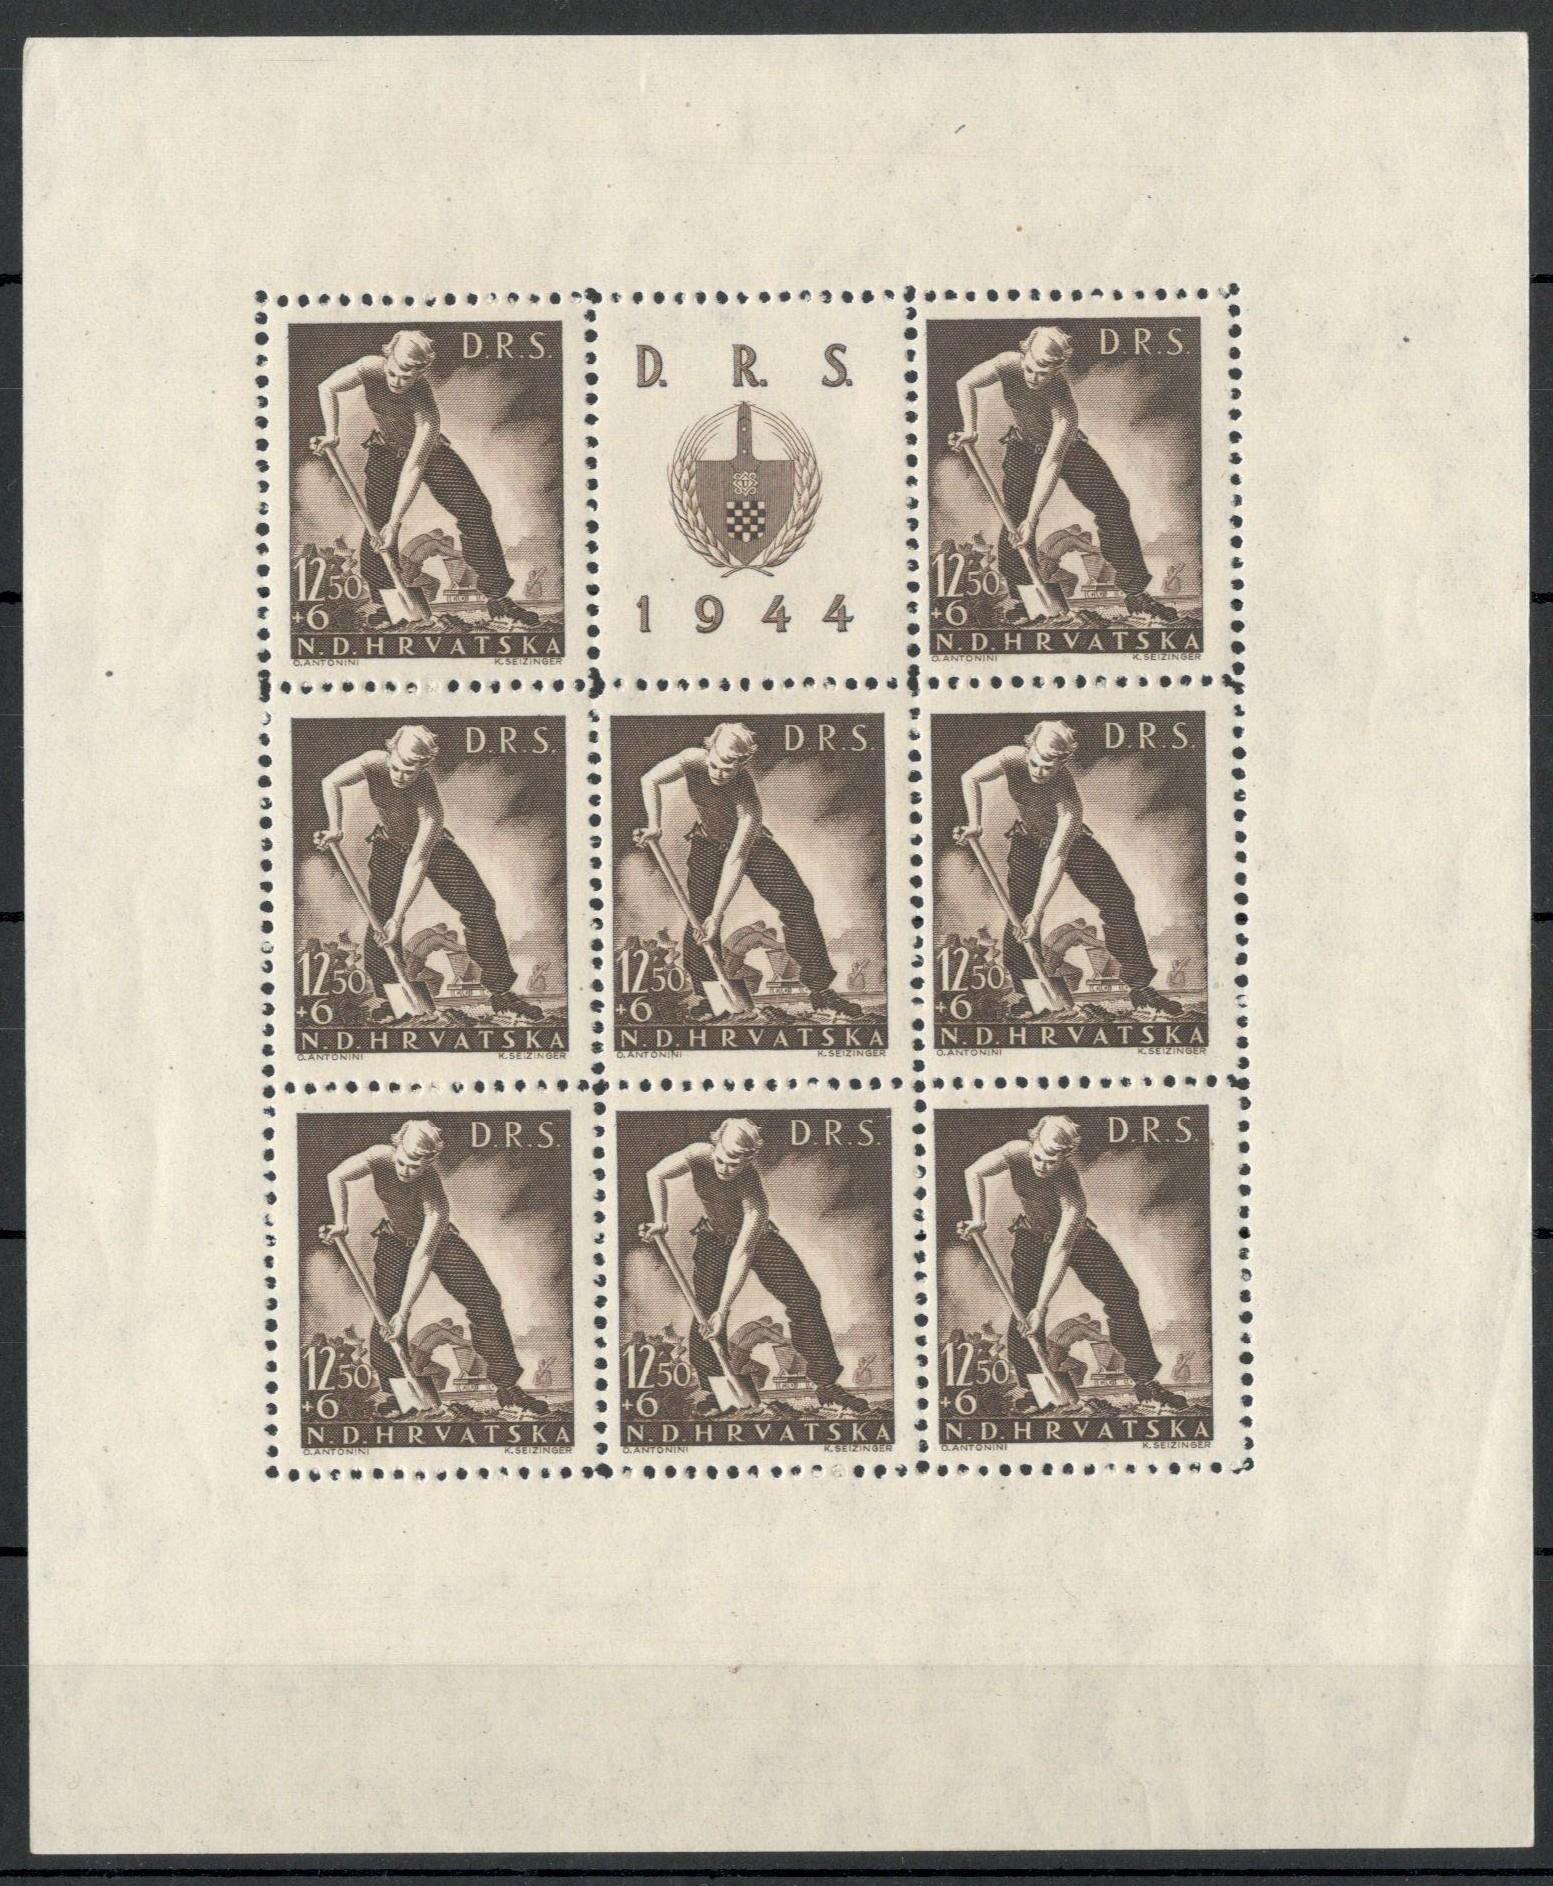 Lot 10 - CROATIA MAY 1944 SEMI-POSTAL STAMPS COMPLETE SET OF FOUR SOUVENIR SHEETS